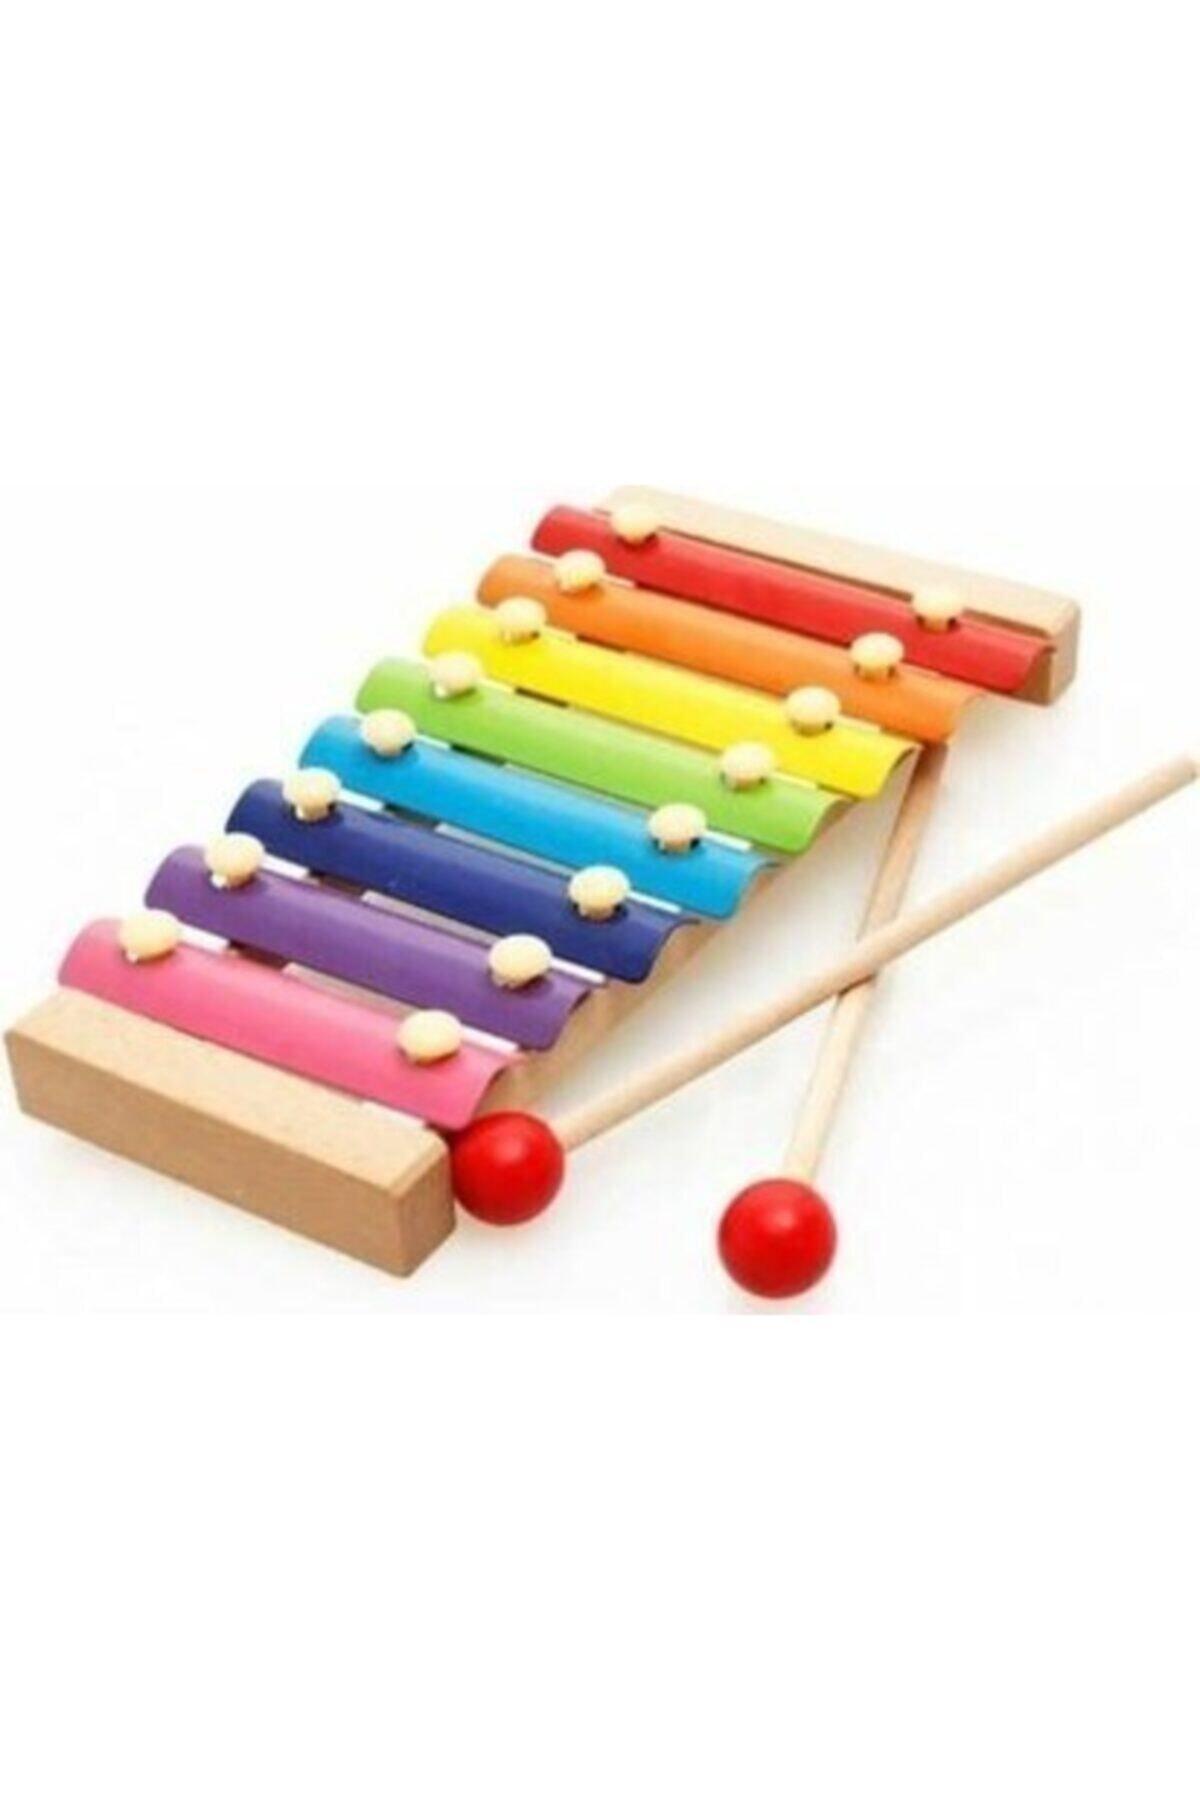 HAMAHA Wooden Toys Eğitici Ahşap Ksilofon 8 Nota 8 Ton 25 Cm 8 Tuşlu Sesli Selefon Oyuncak 1